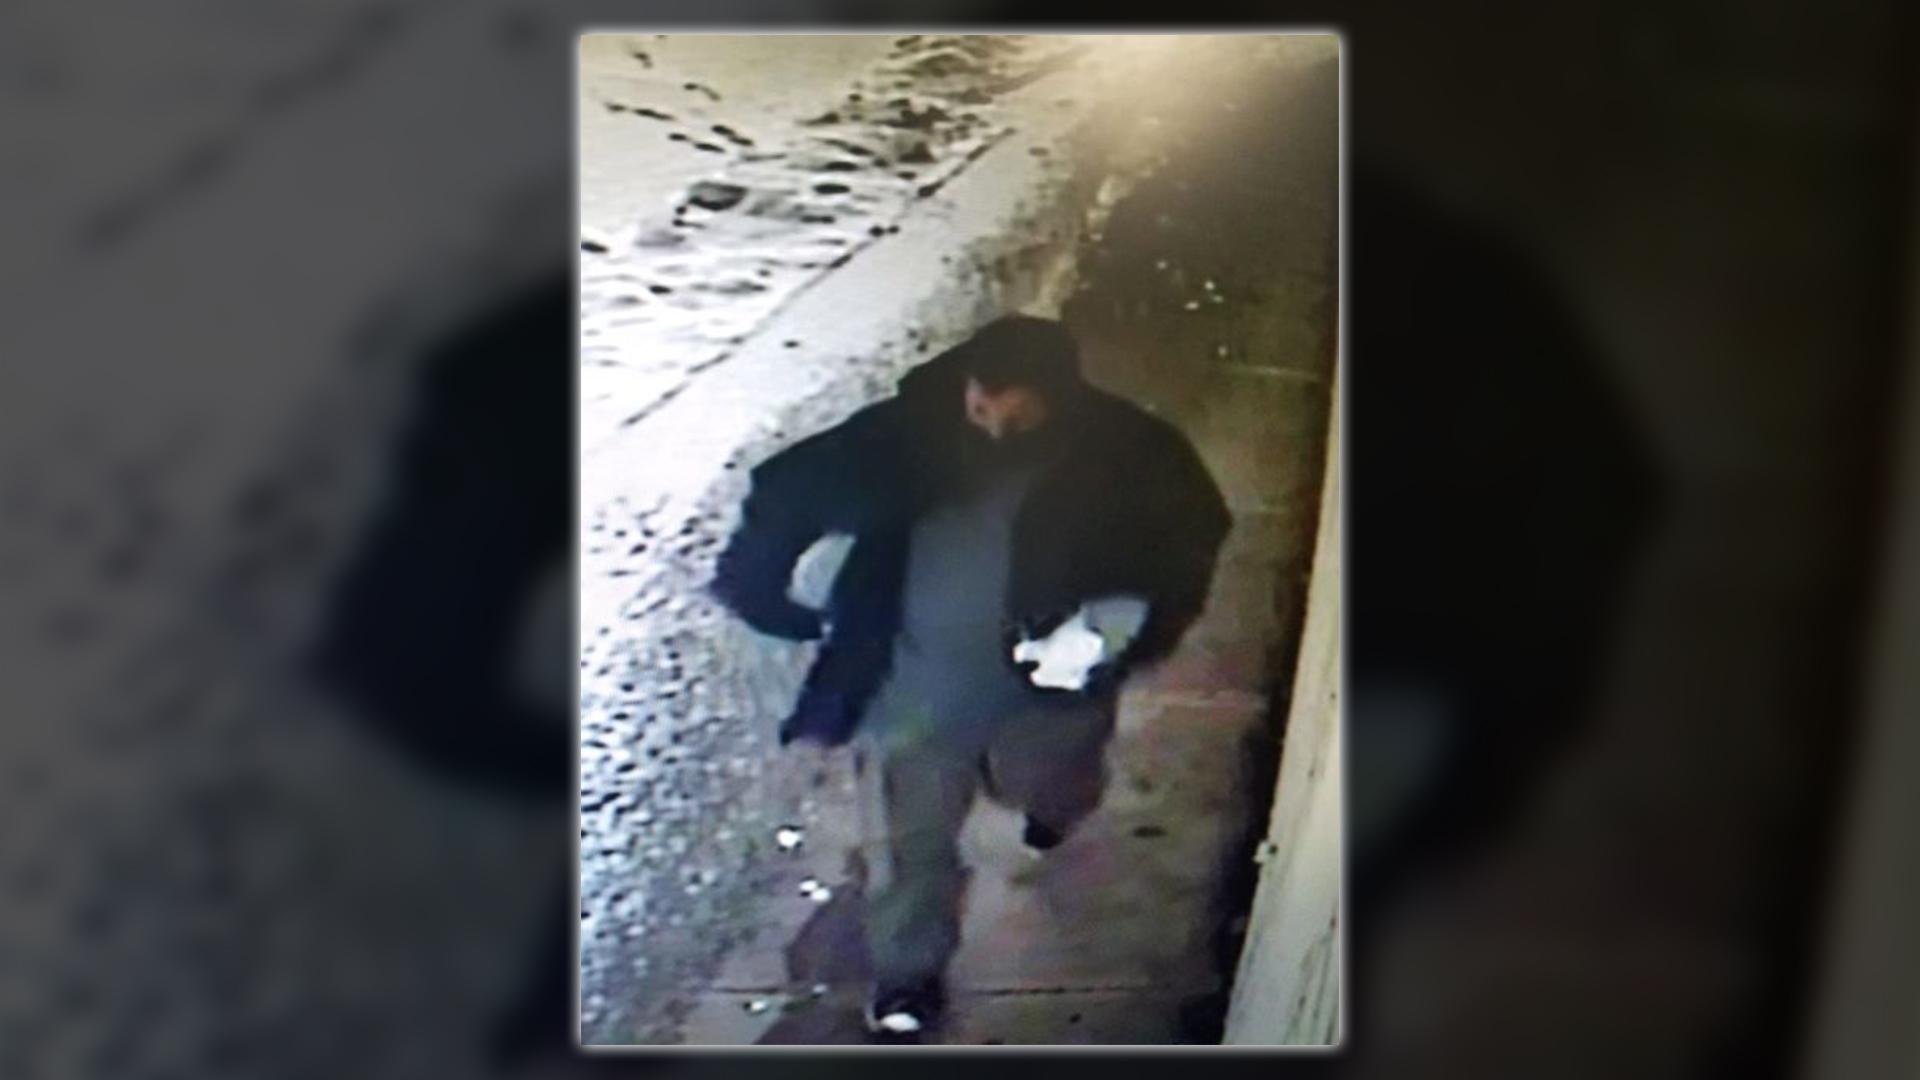 Surveillance footage of the suspect. (Klamath Falls Police Department)